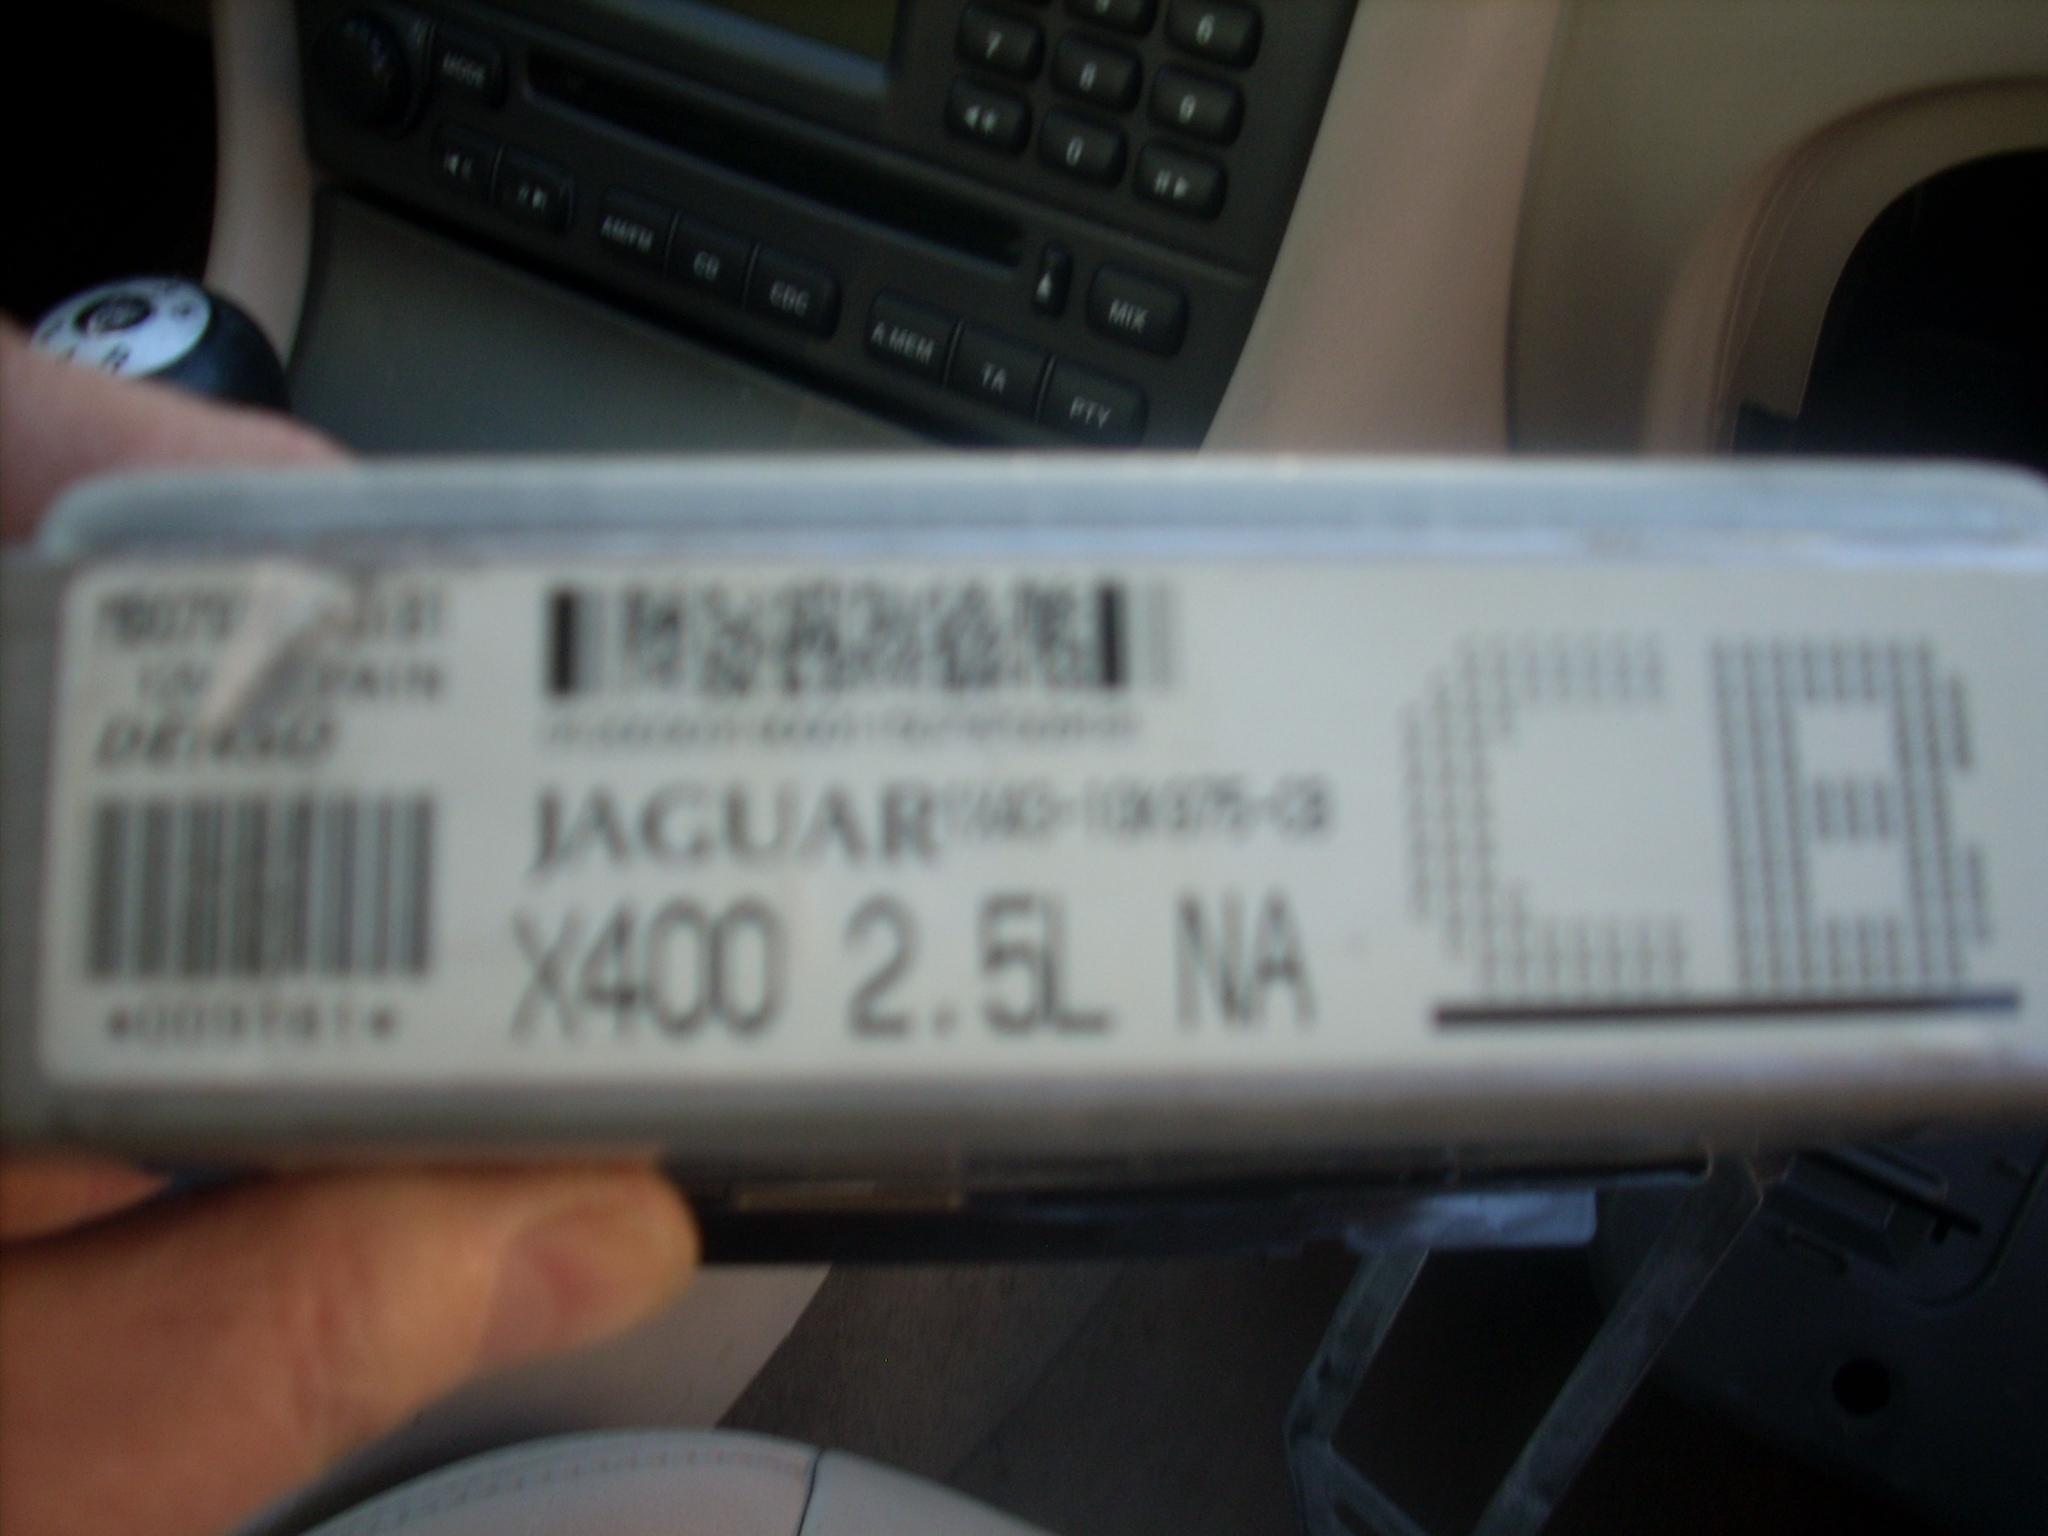 Jaguar Xj8 Fuse Box Diagram Furthermore 2004 Jaguar S Type Engine